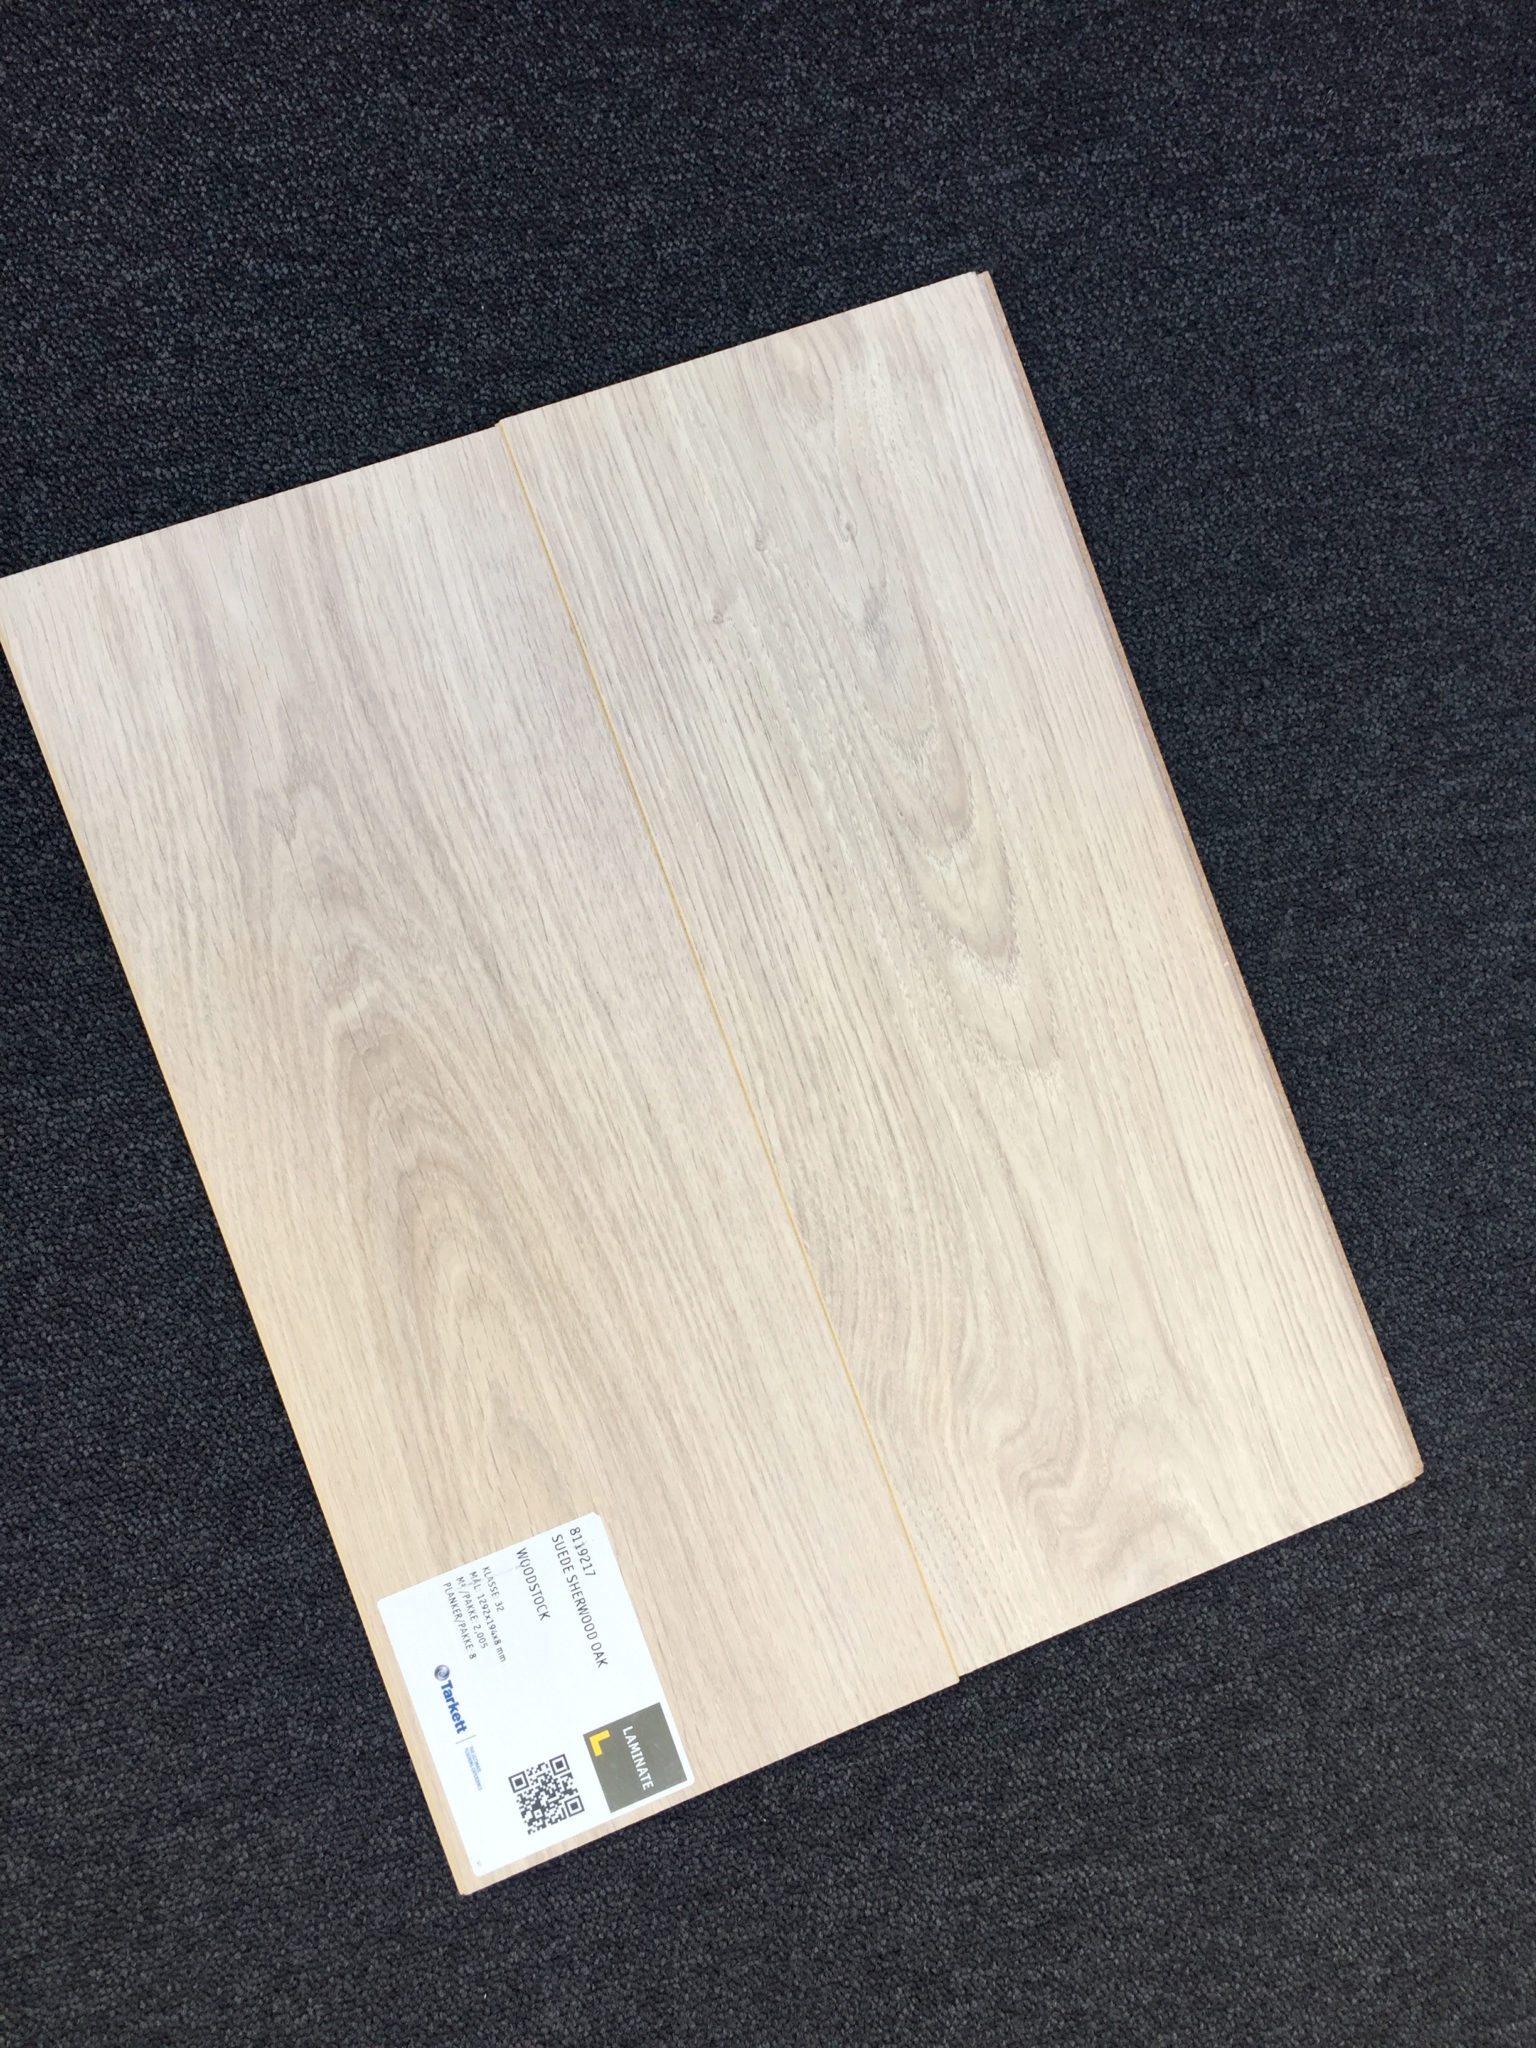 tarkett gulv laminat suede sherwood oak